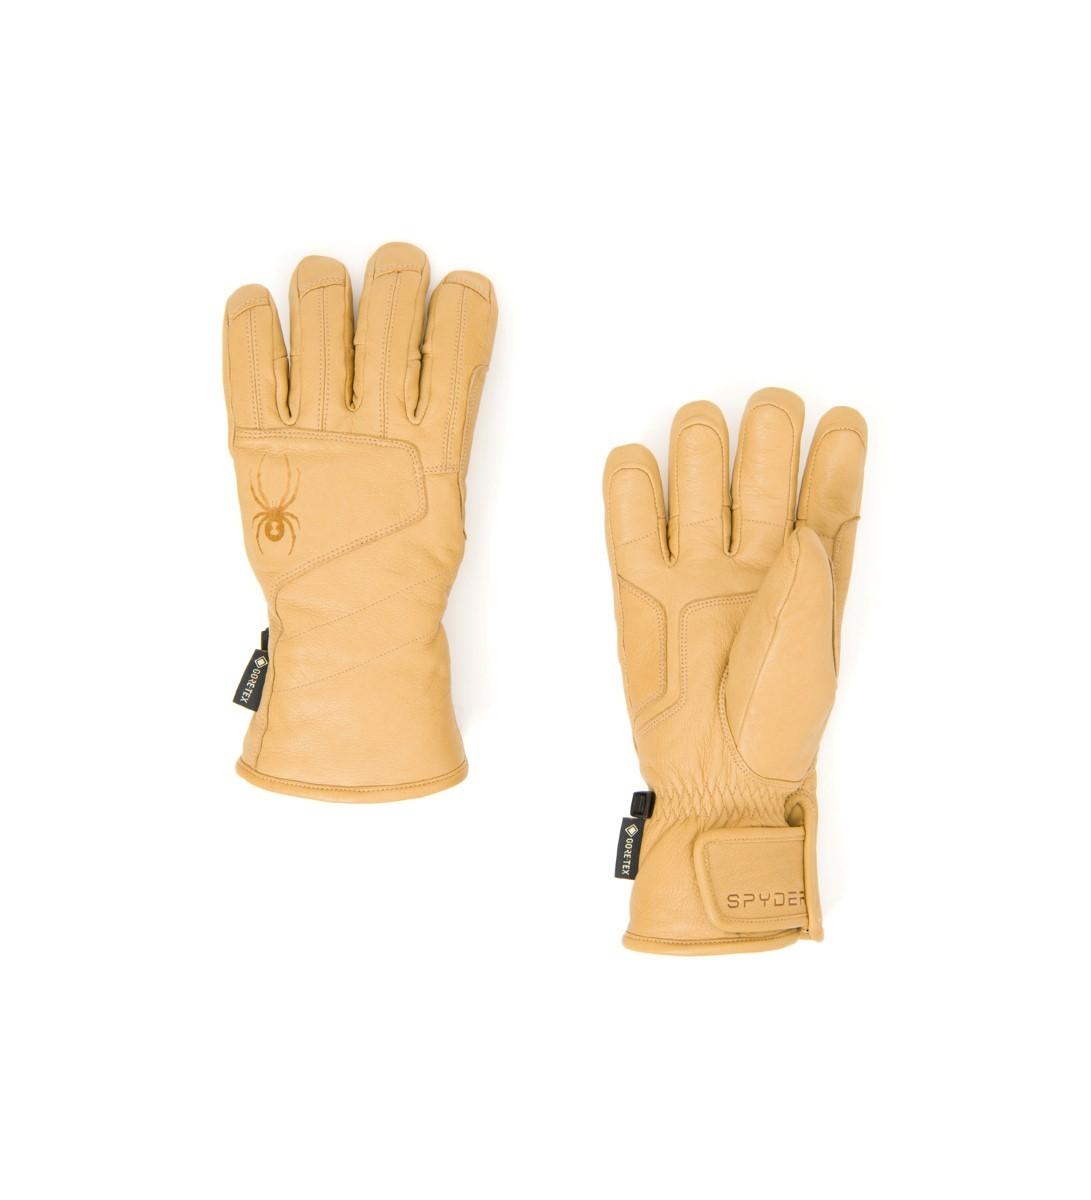 Spyder M Turret Gtx Ski Glove 2020